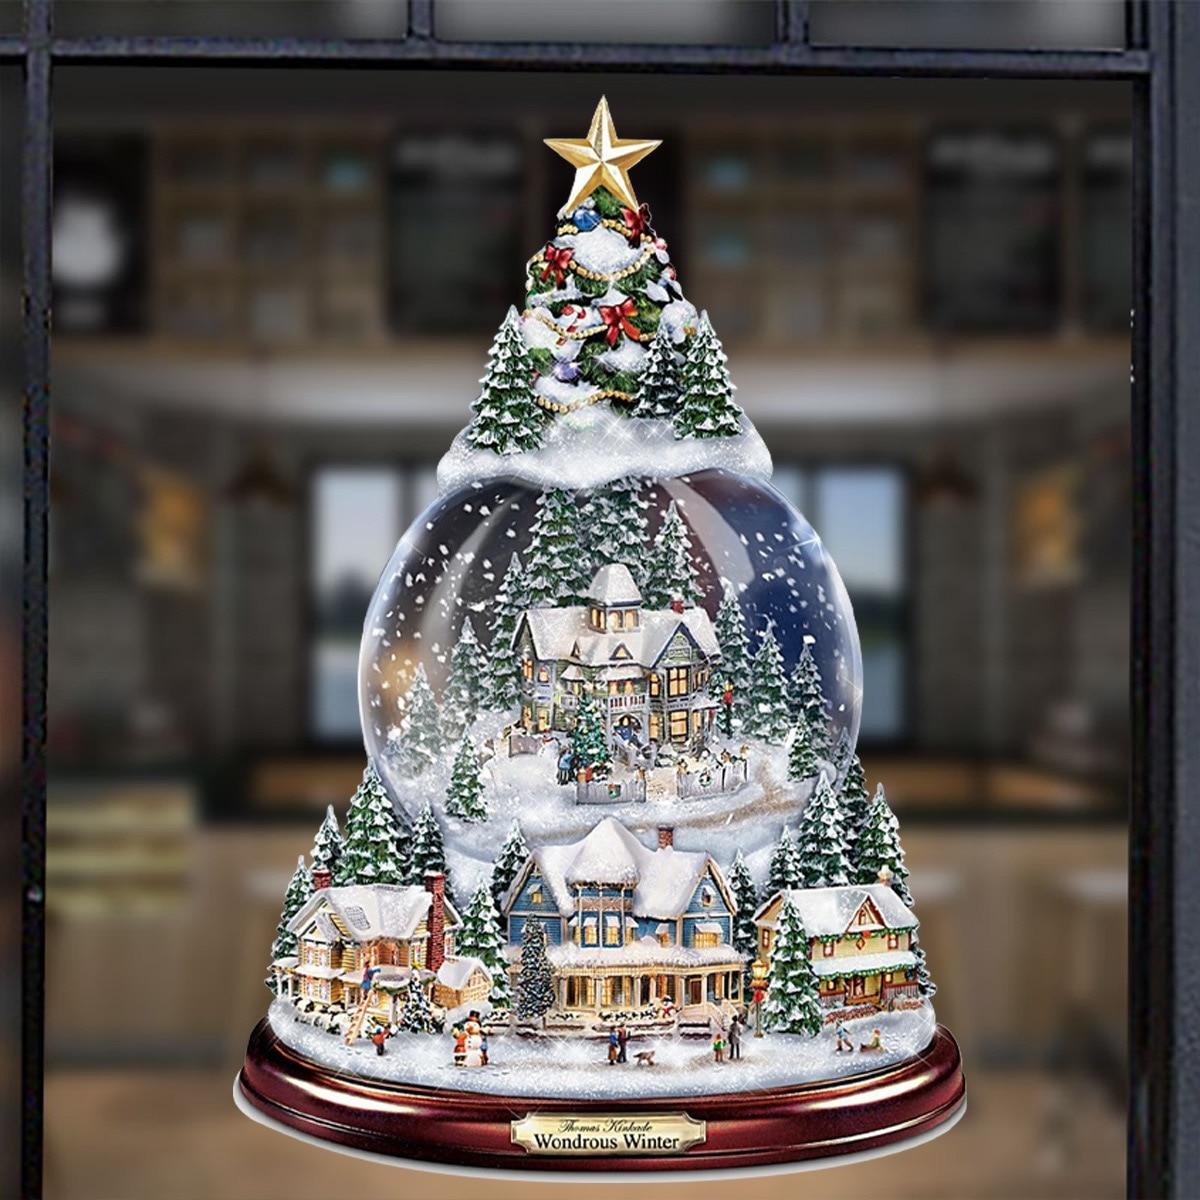 20x30cm Christmas Tree Rotating Sculpture Train Decorations Paste Window Paste Stickers Christmas Decorations Winter Home Decor